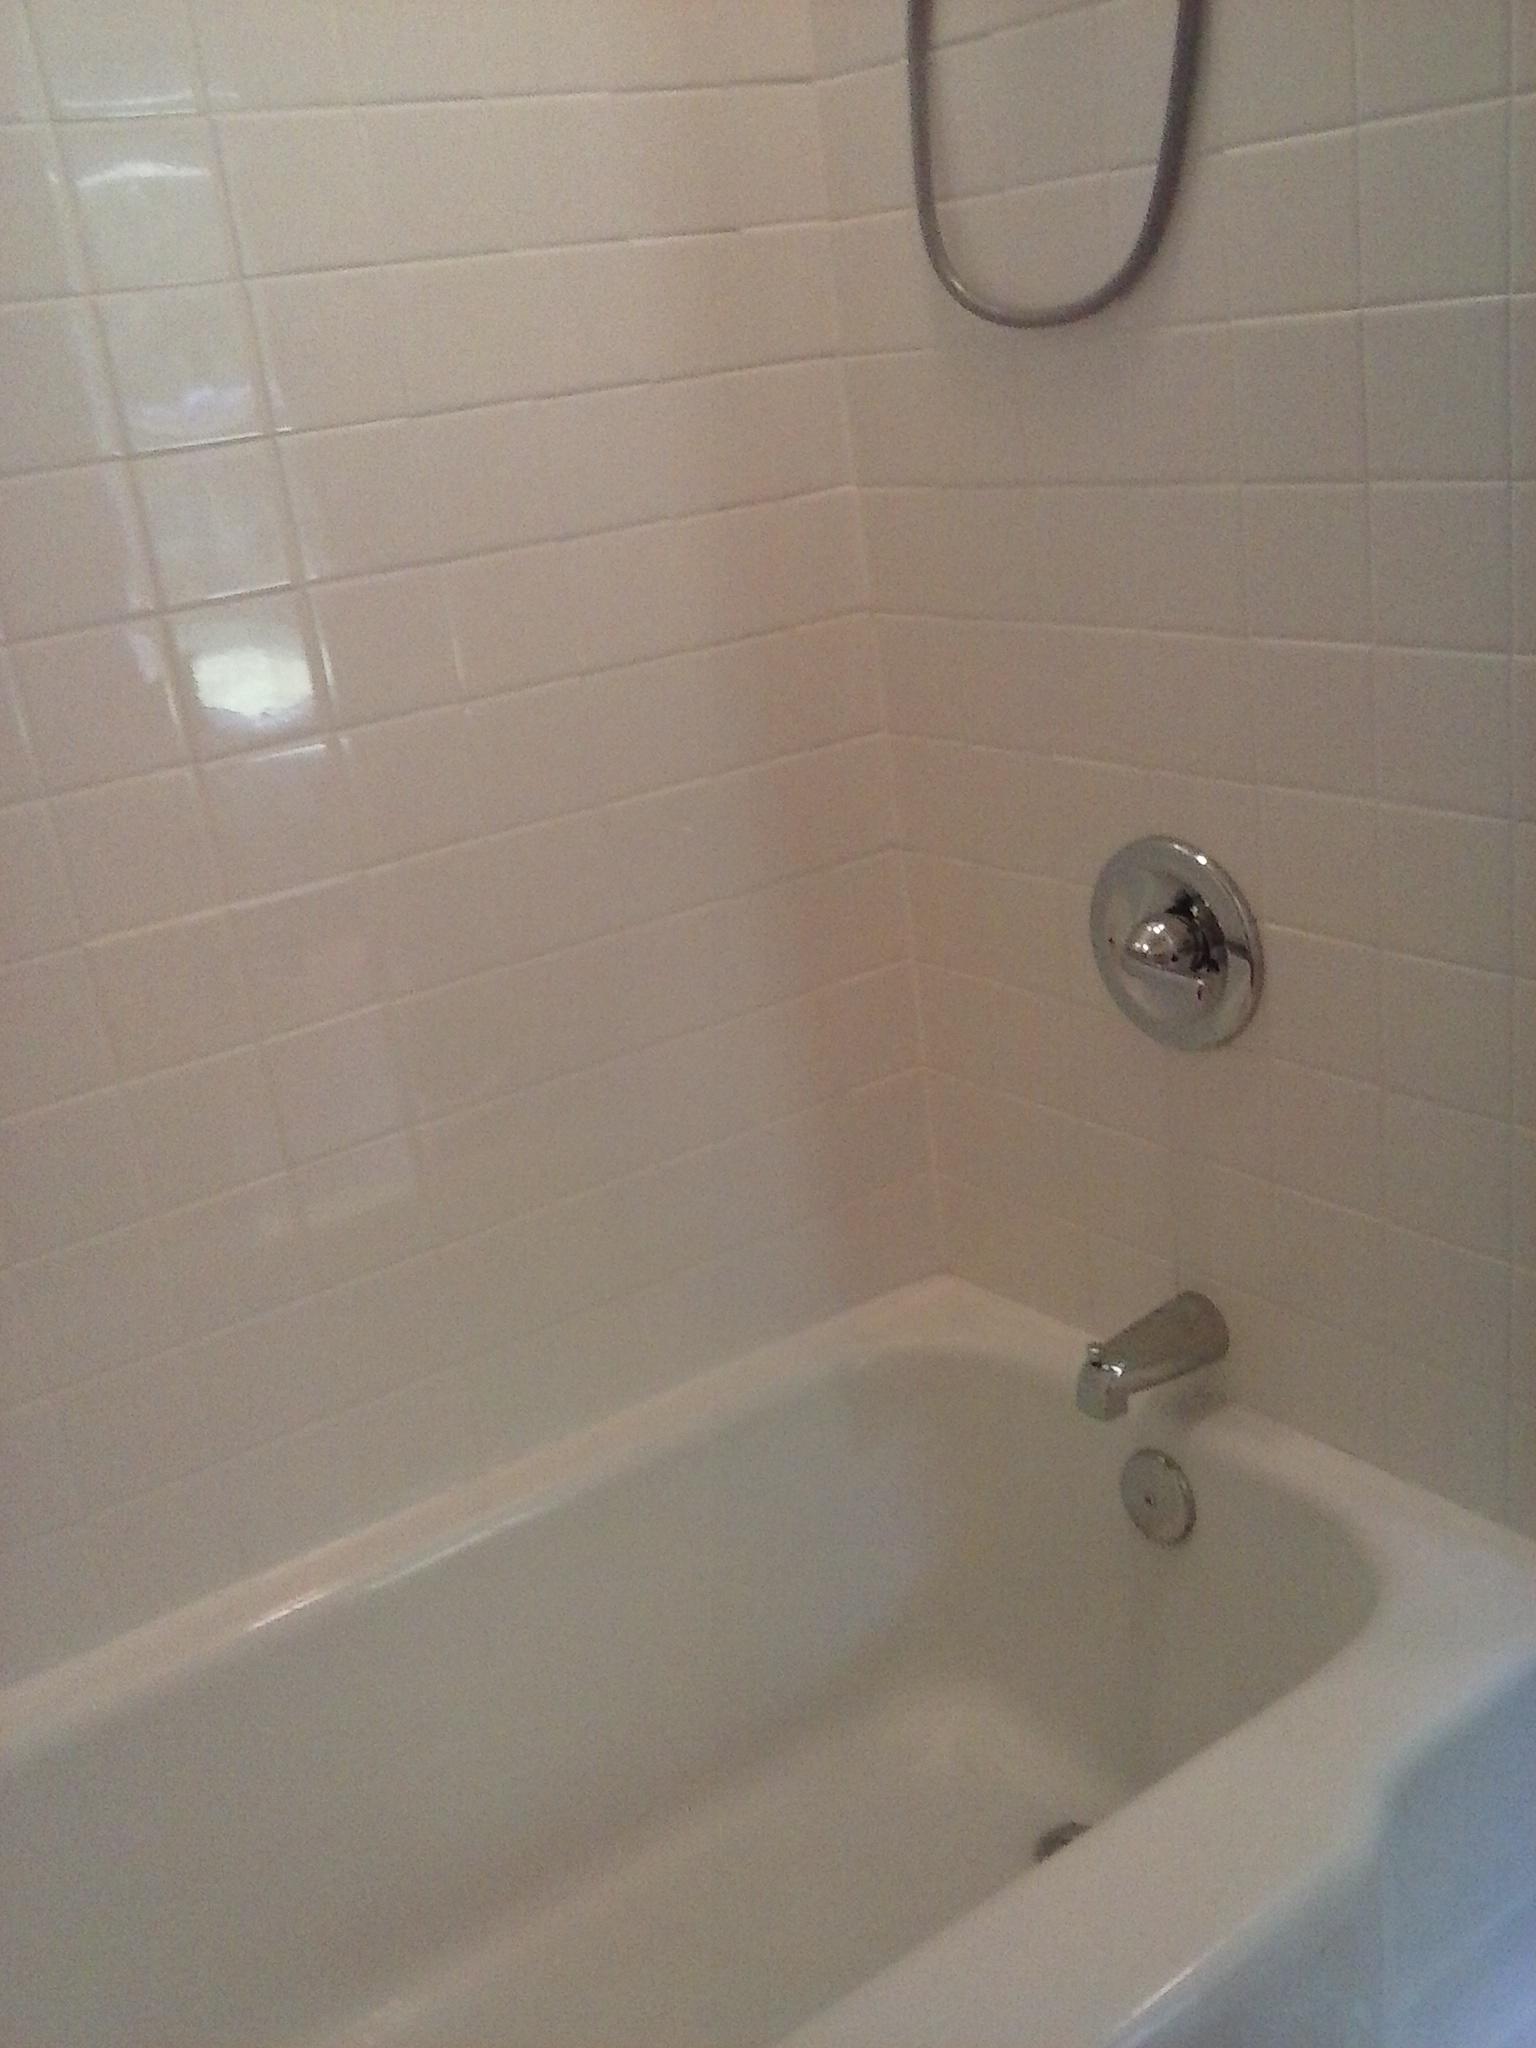 Tub Tile Matt Crass - 4x4 bathtub